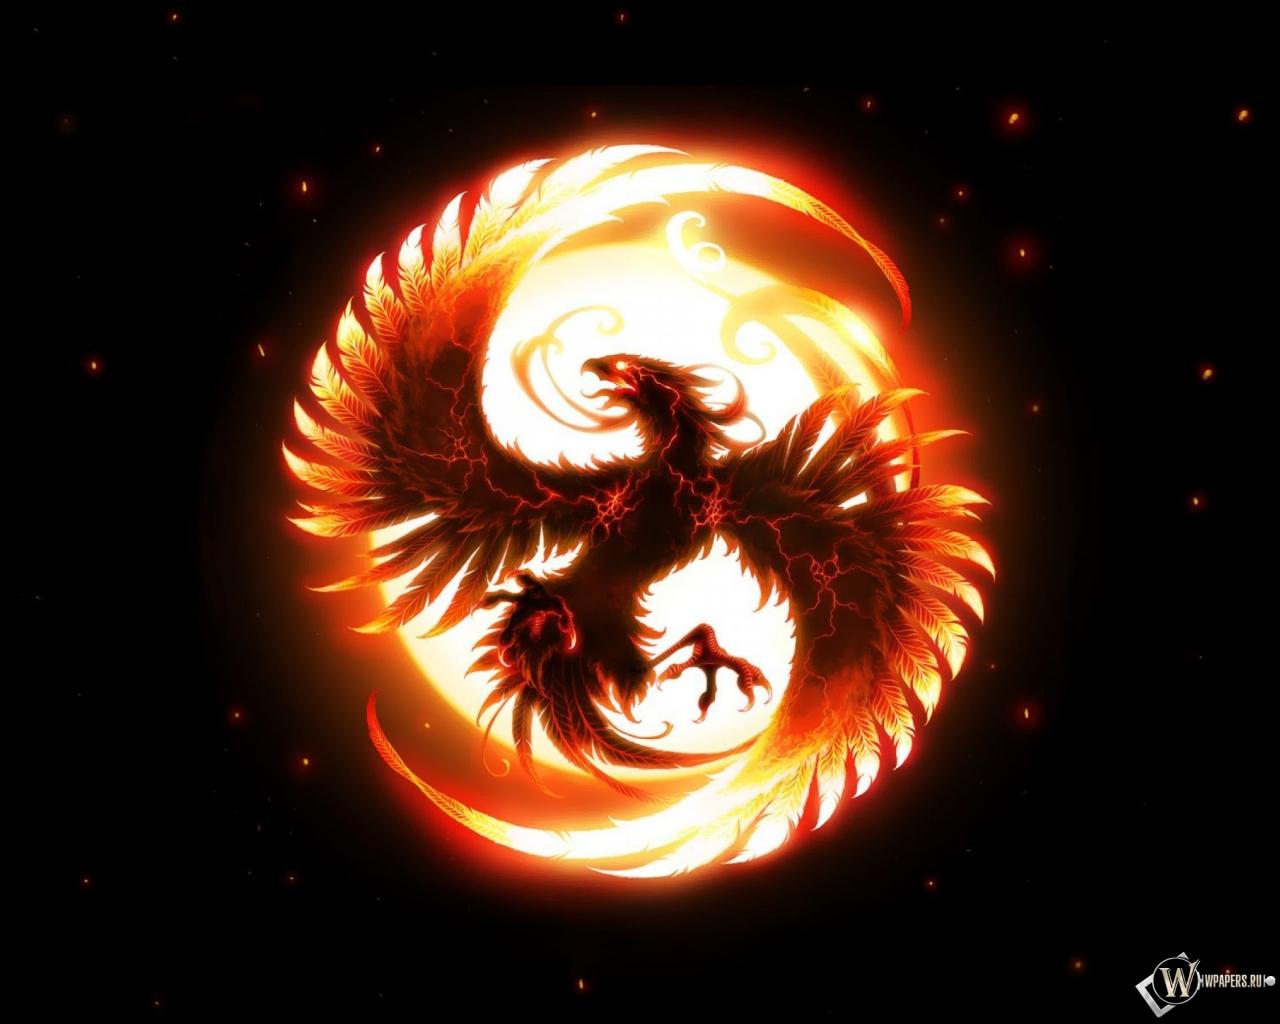 Phoenix 1280x1024